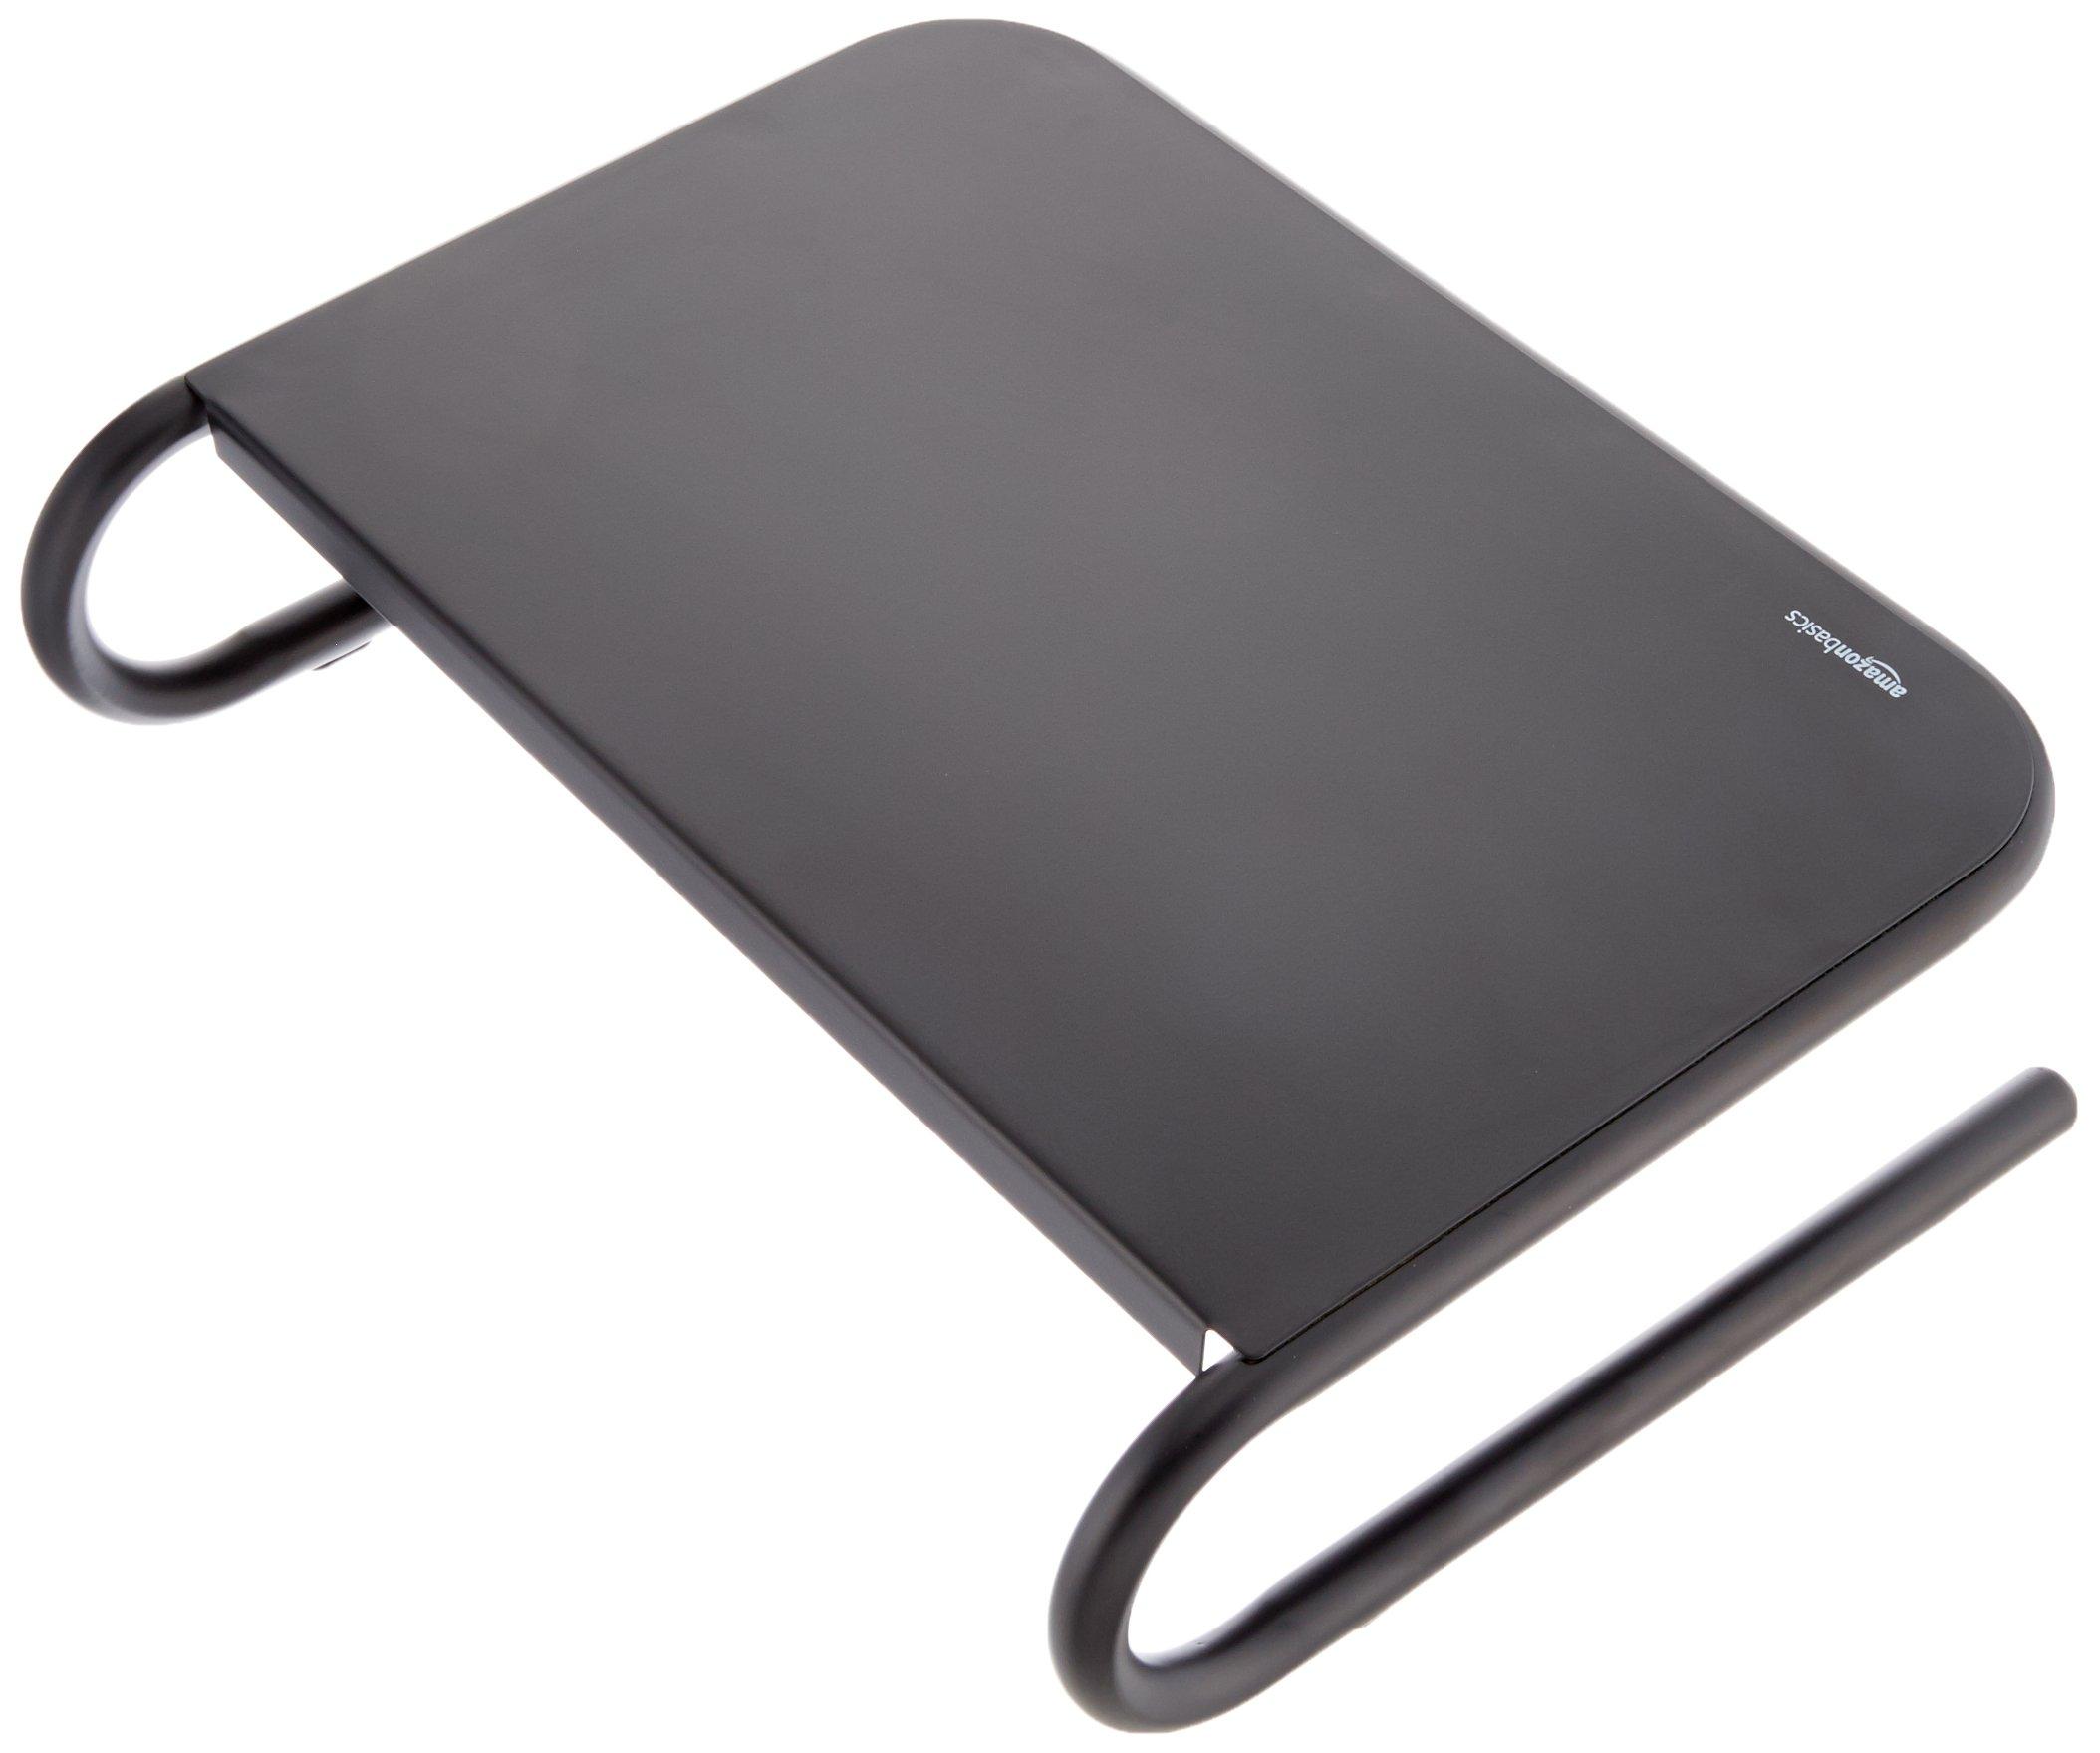 AmazonBasics Metal Monitor Stand - Black by AmazonBasics (Image #3)